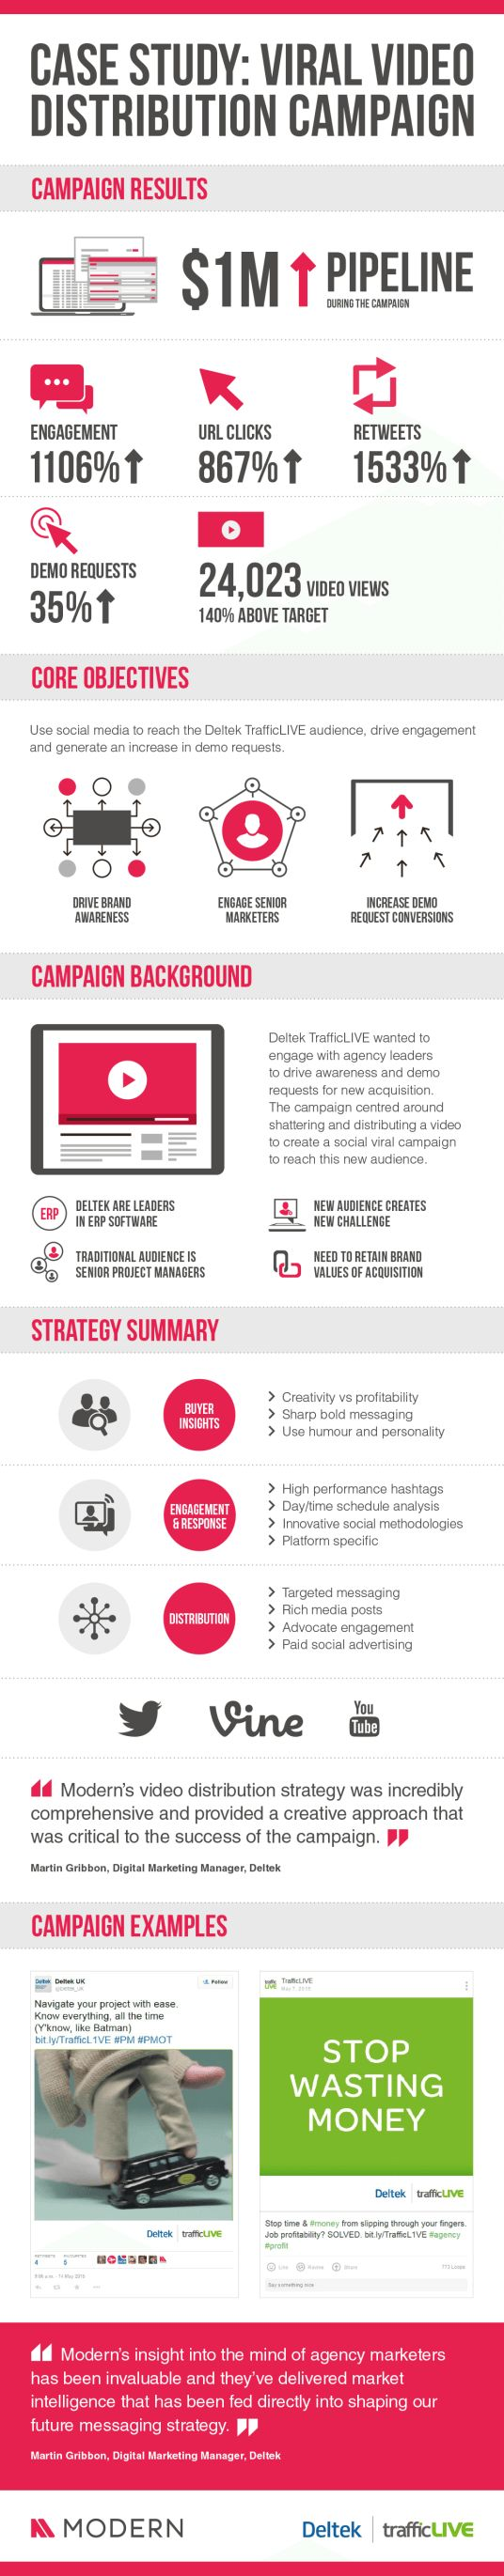 Case Study: Viral Video Distribution through social media #CaseStudy #B2BMarketing #SocialMedia #Video